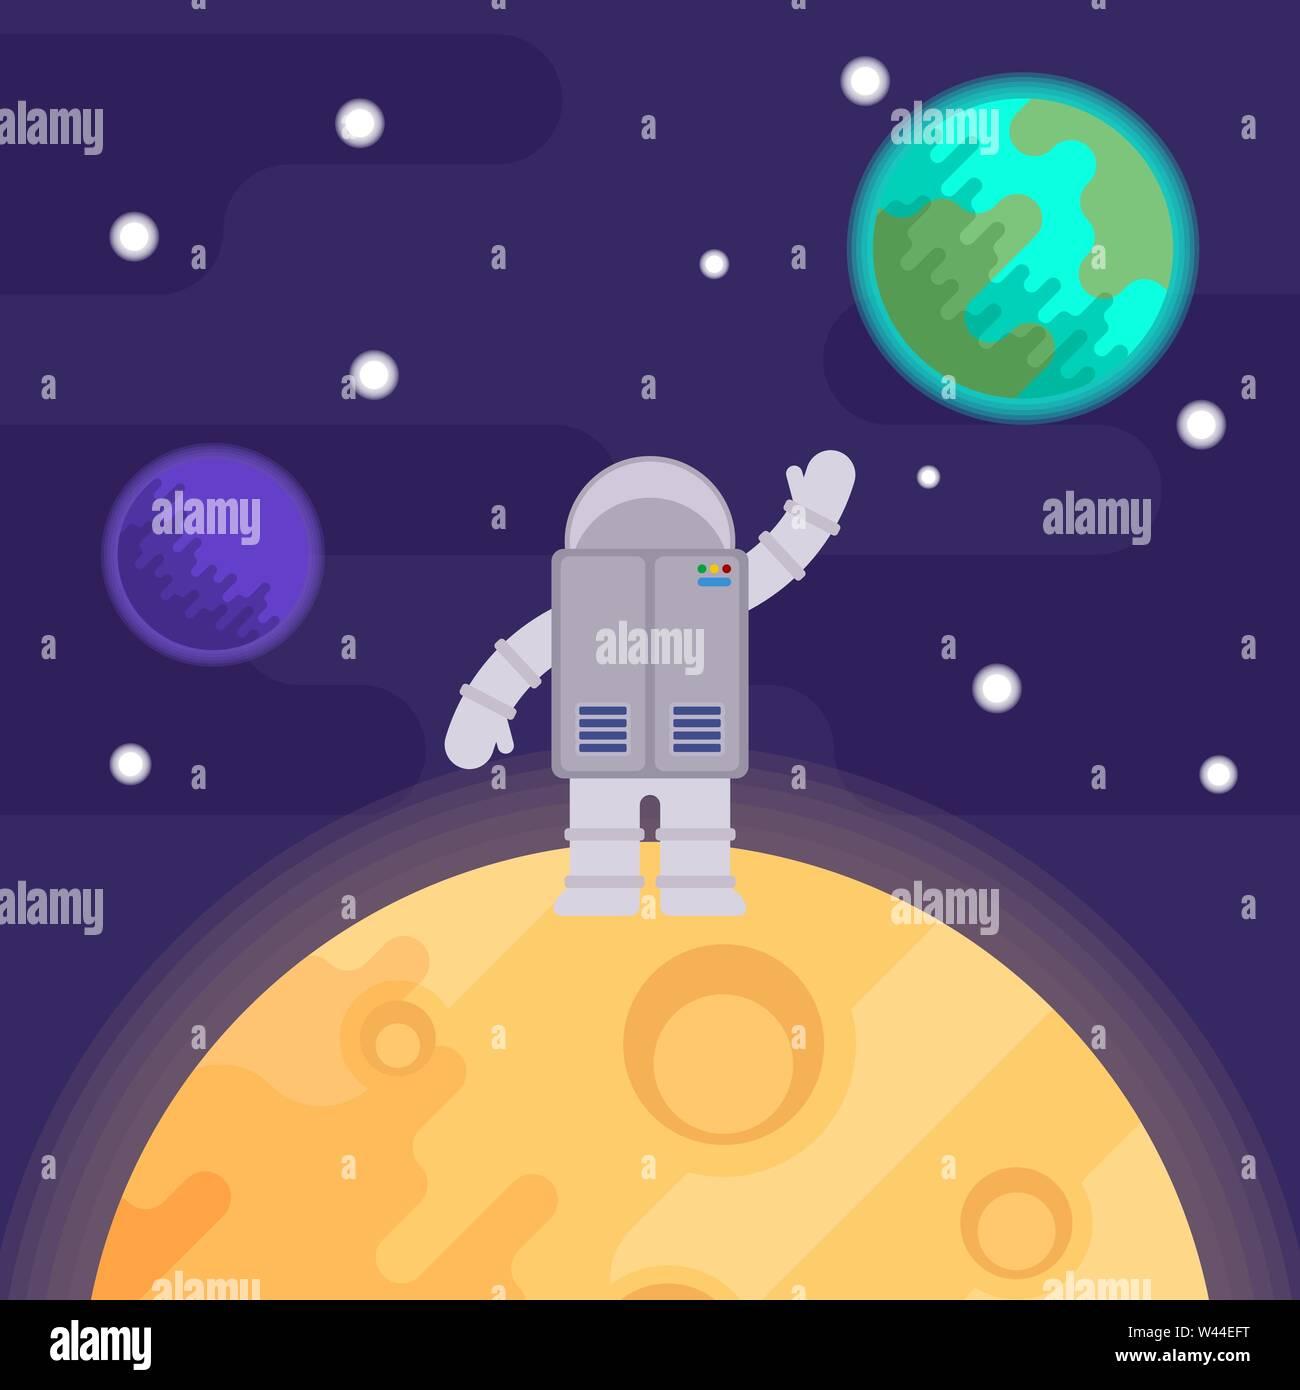 the first man on the moon, apollo 11. nasa. Vector flat illustration. - Stock Vector